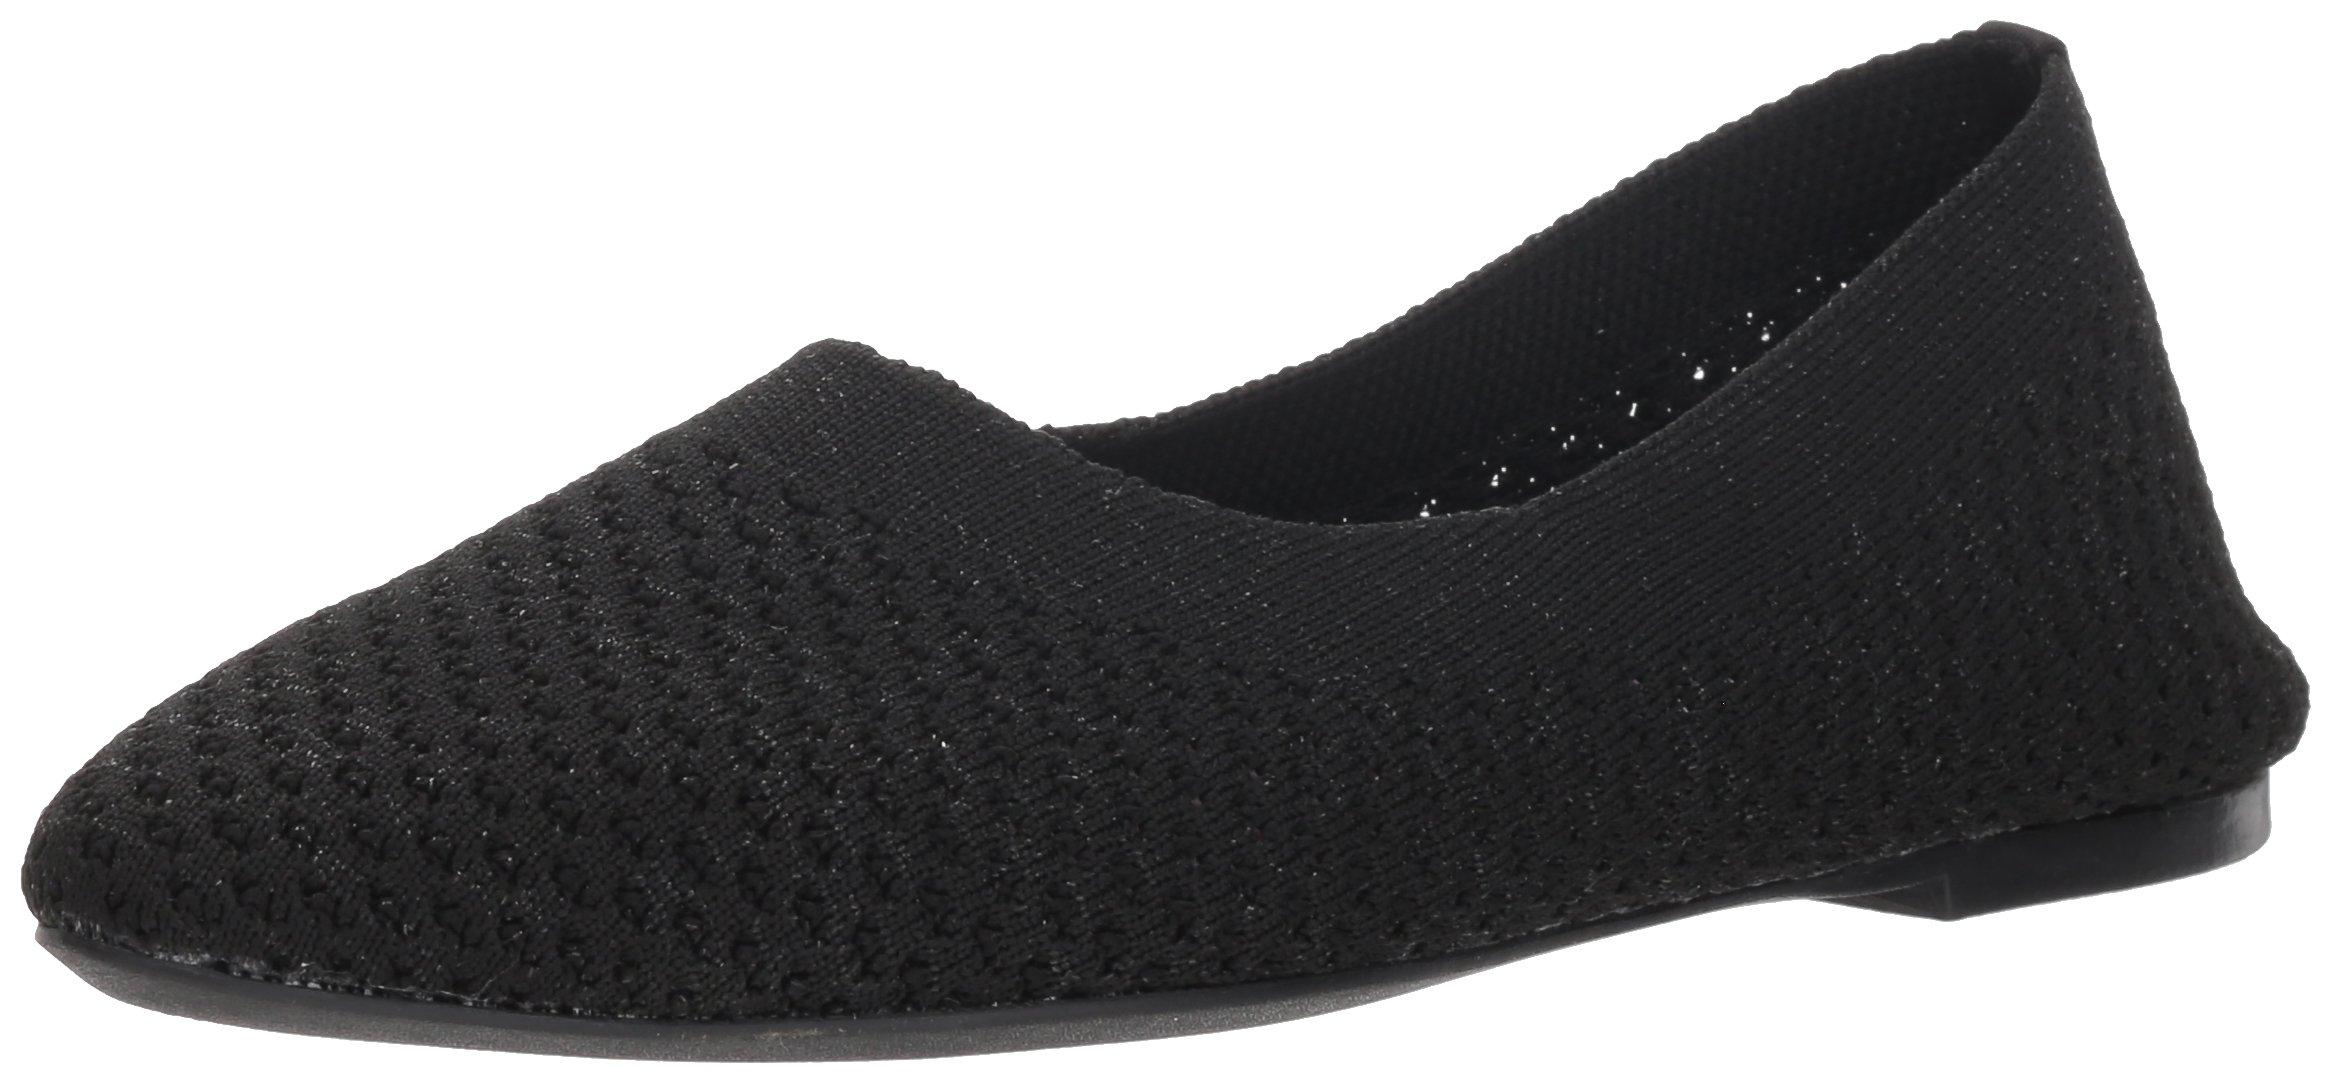 Skechers Women's Cleo-Star Daze-Metallic Engineered Knit Skimmer Ballet Flat, Black, 11 M US